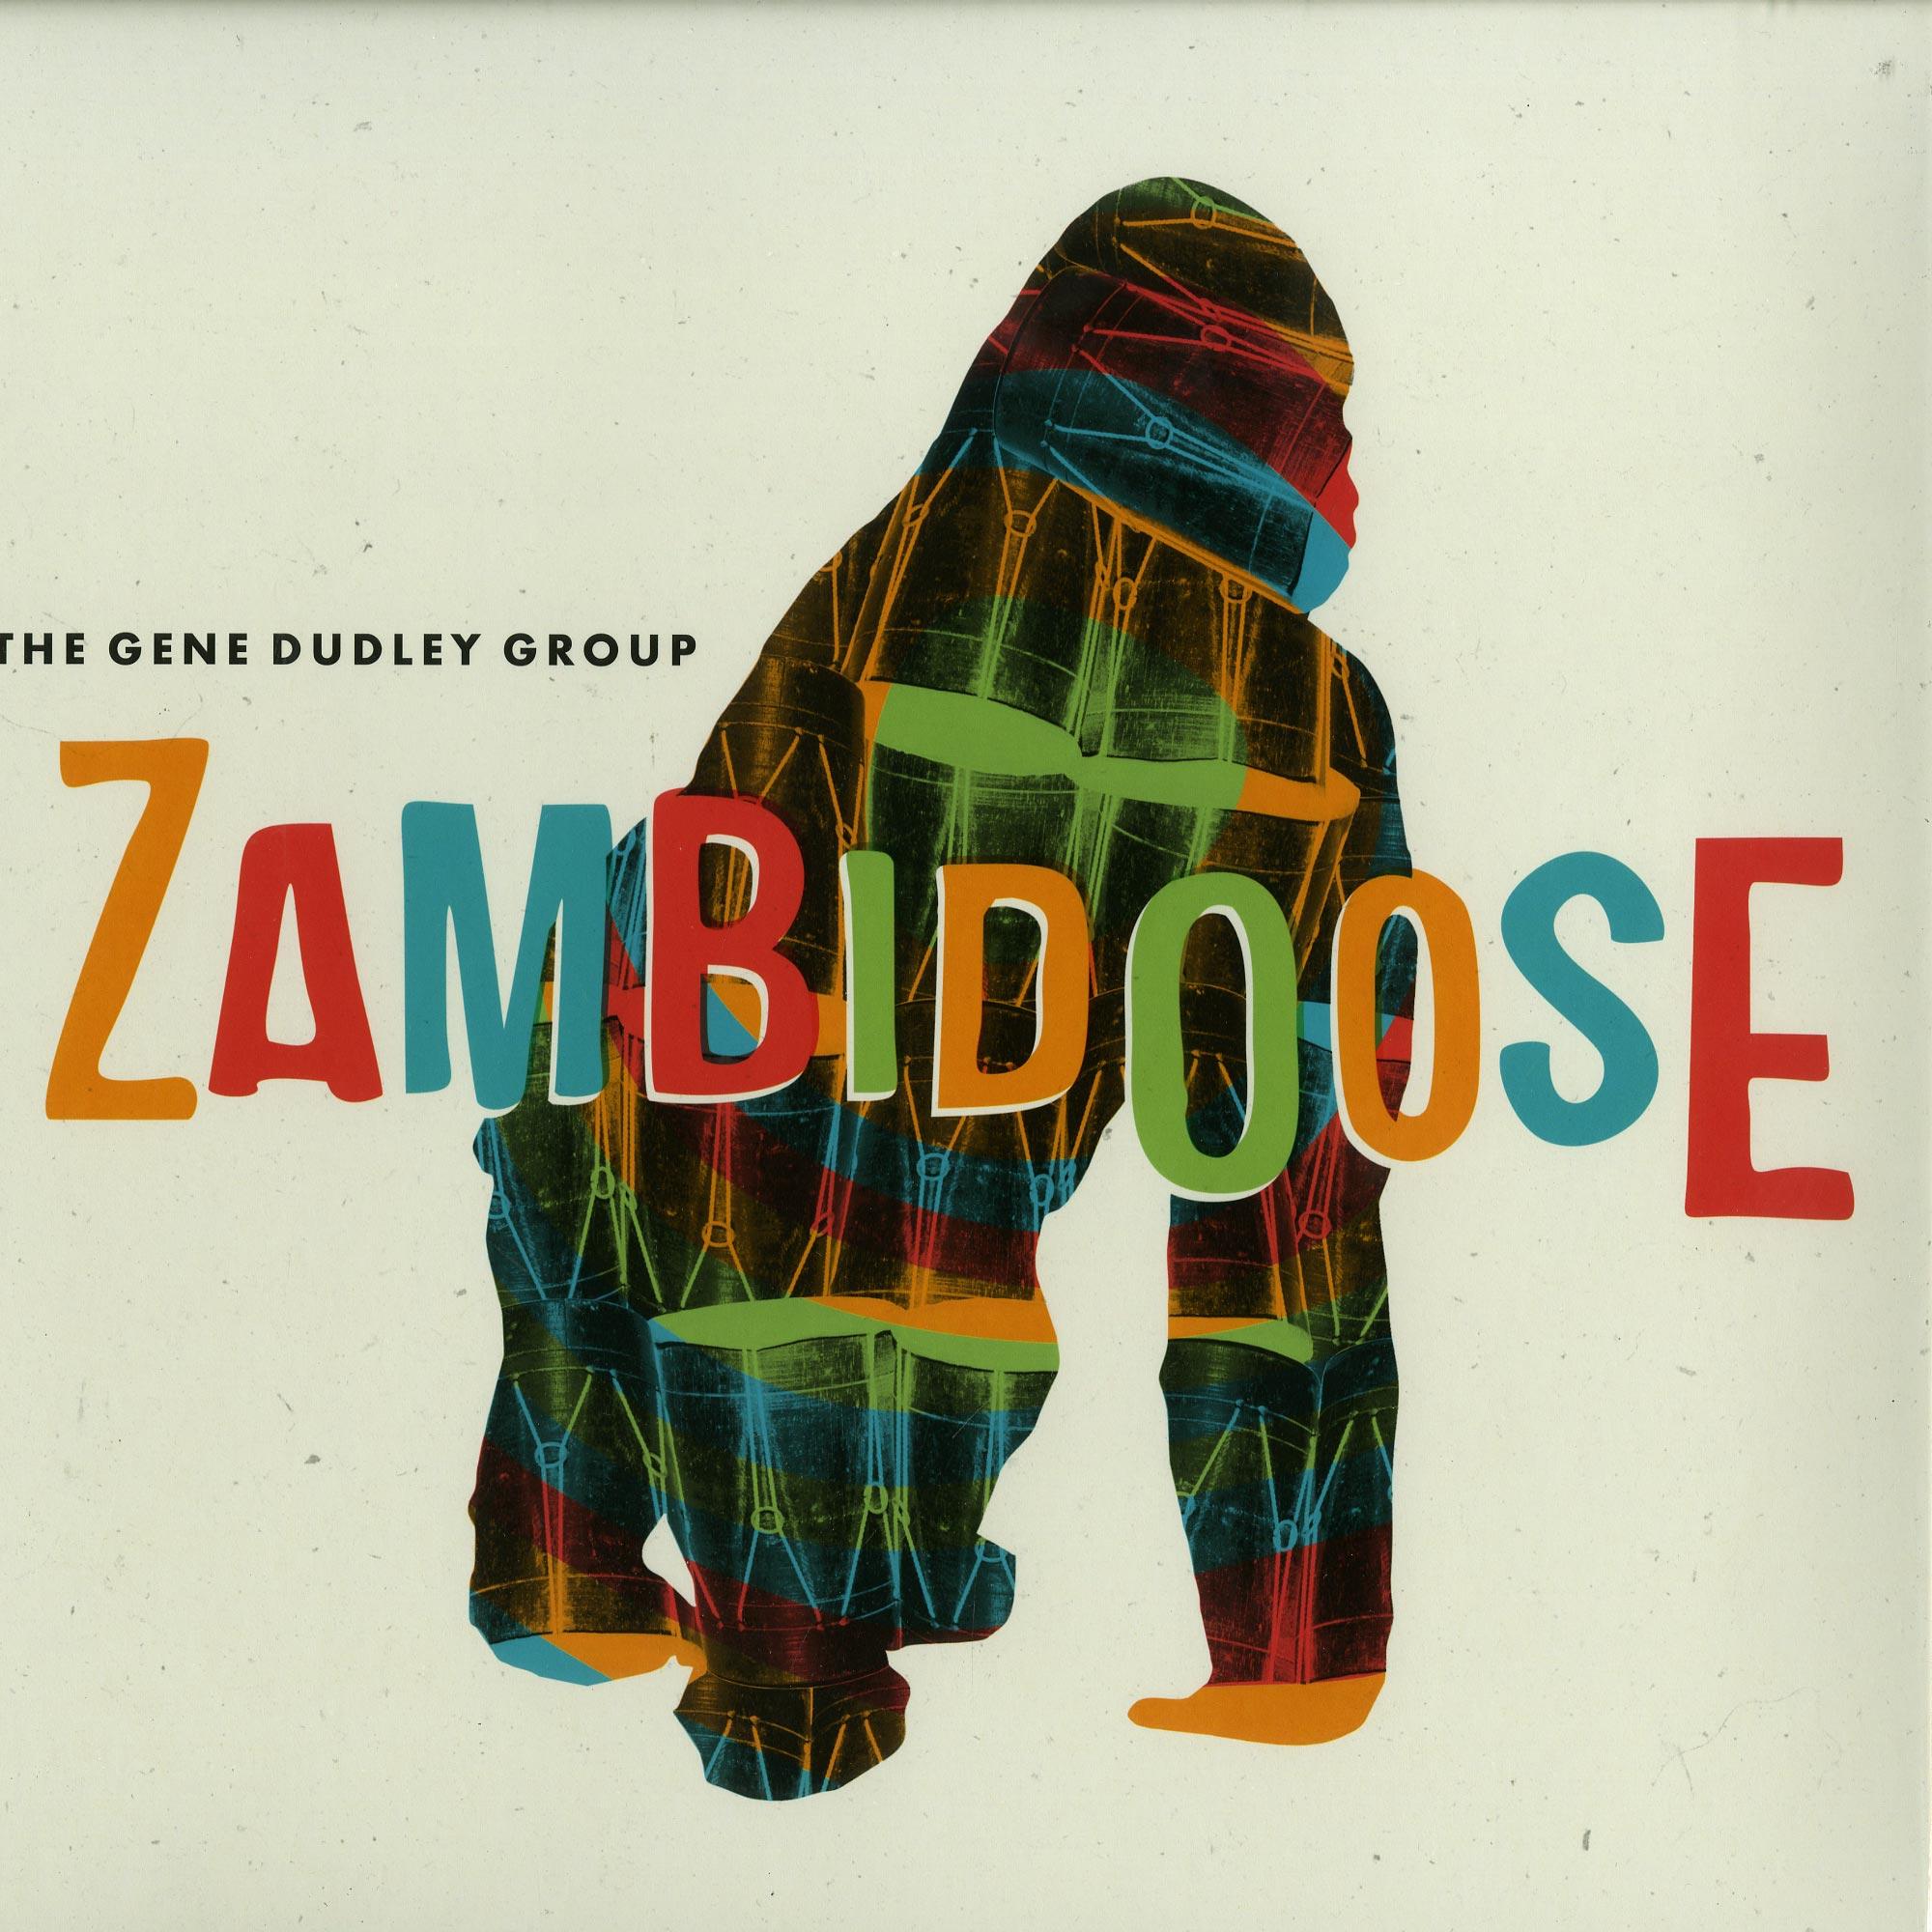 The Gene Dudley Group - ZAMBIDOOSE